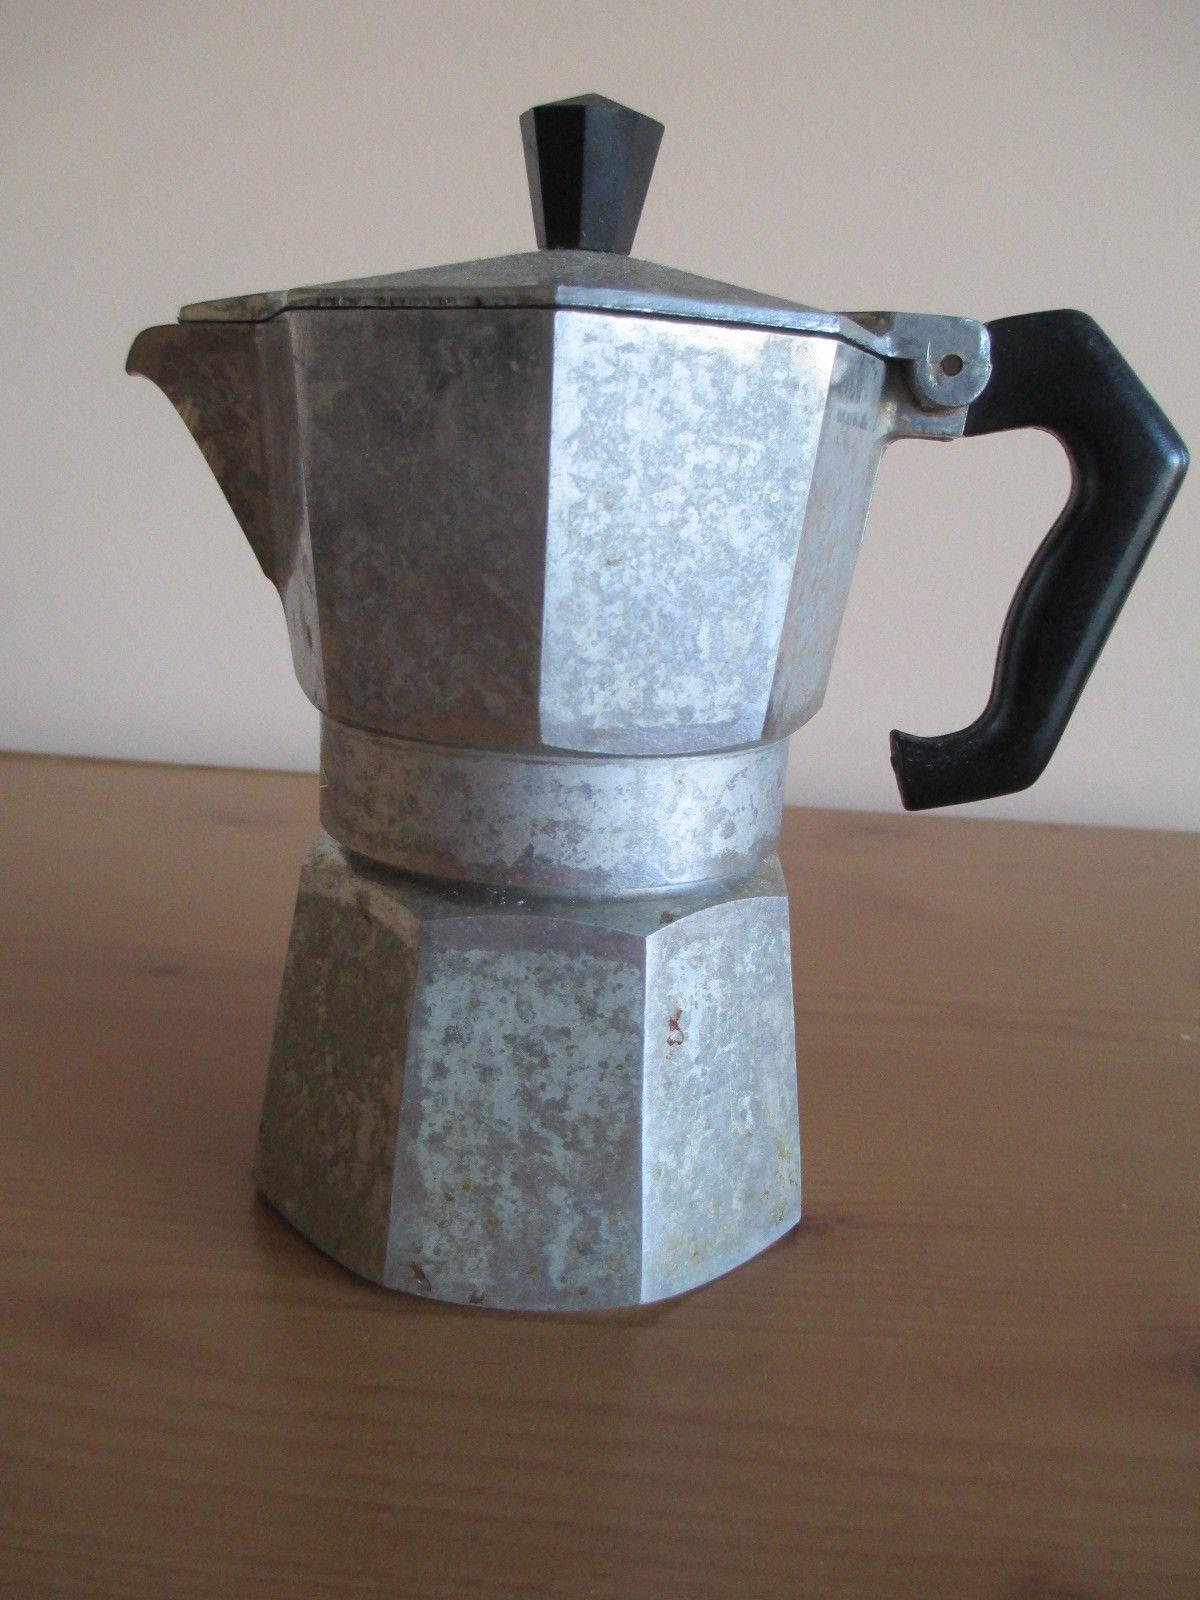 VTG ALUMINUM MORENITA ESPRESSO COFFEE MAKER, MADE IN ITALY